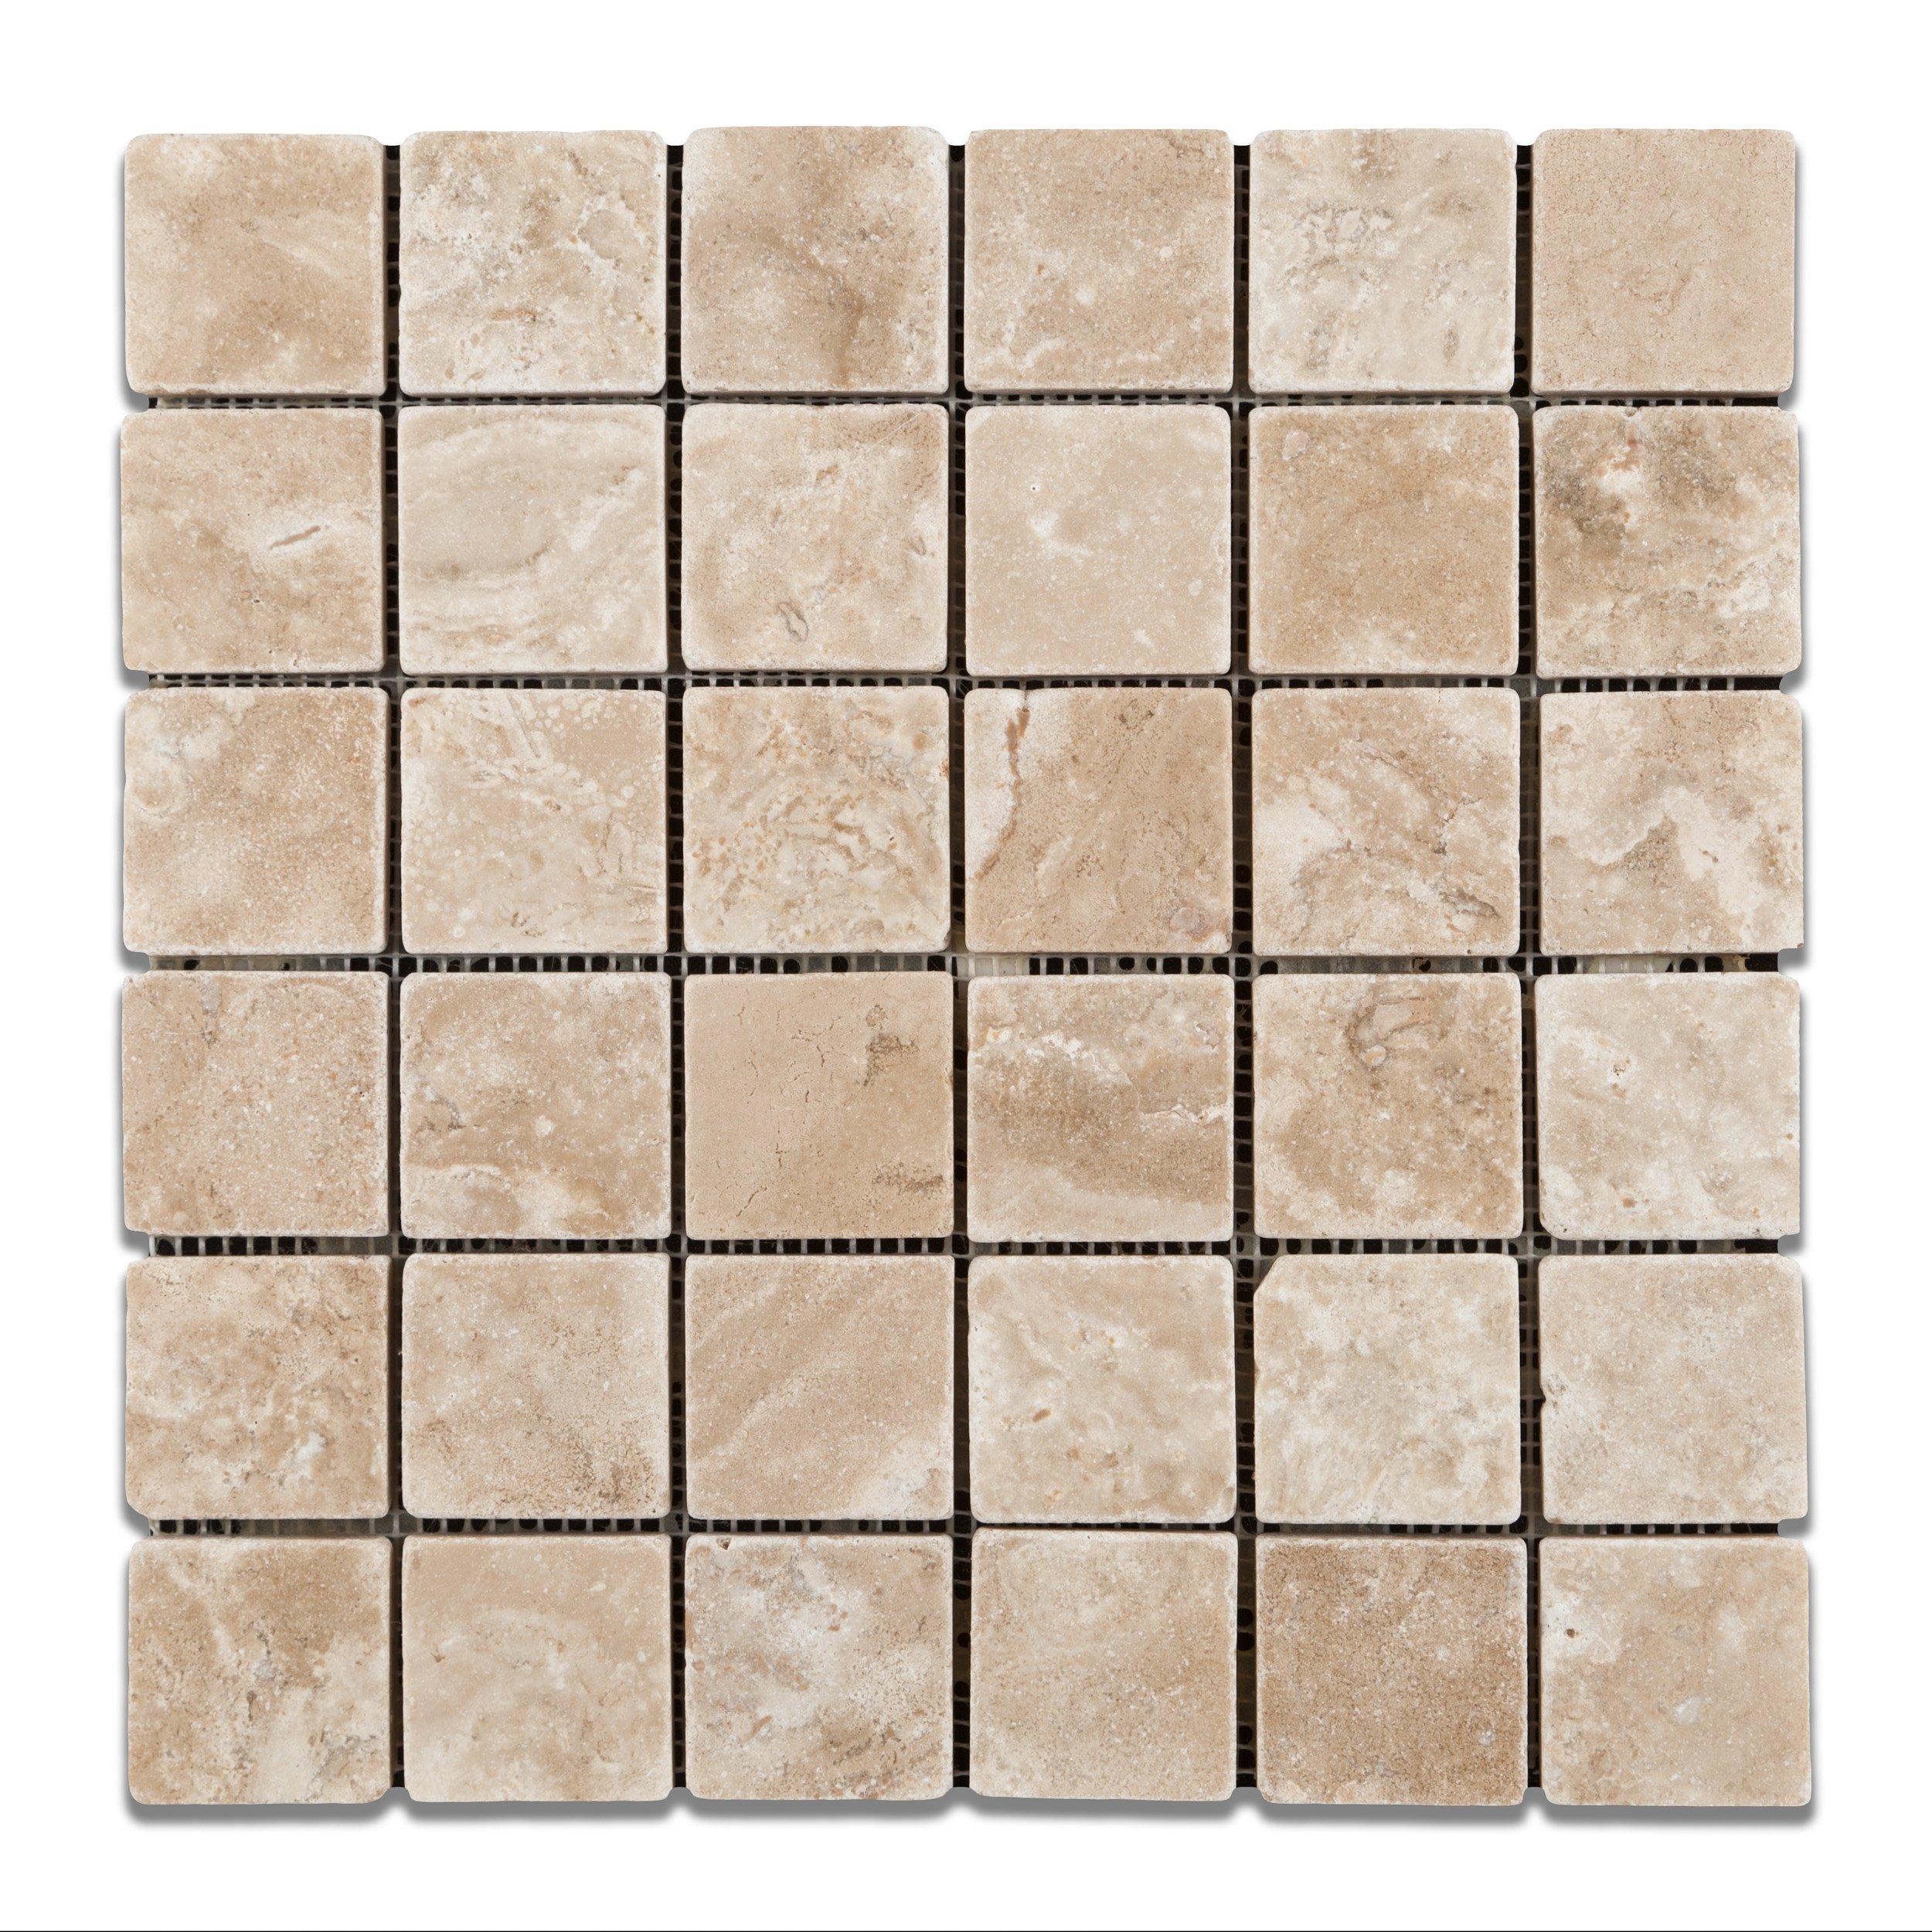 Durango Cream (Paredon) Travertine 2 X 2 Tumbled Mosaic Tile - Lot of 50 Sheets